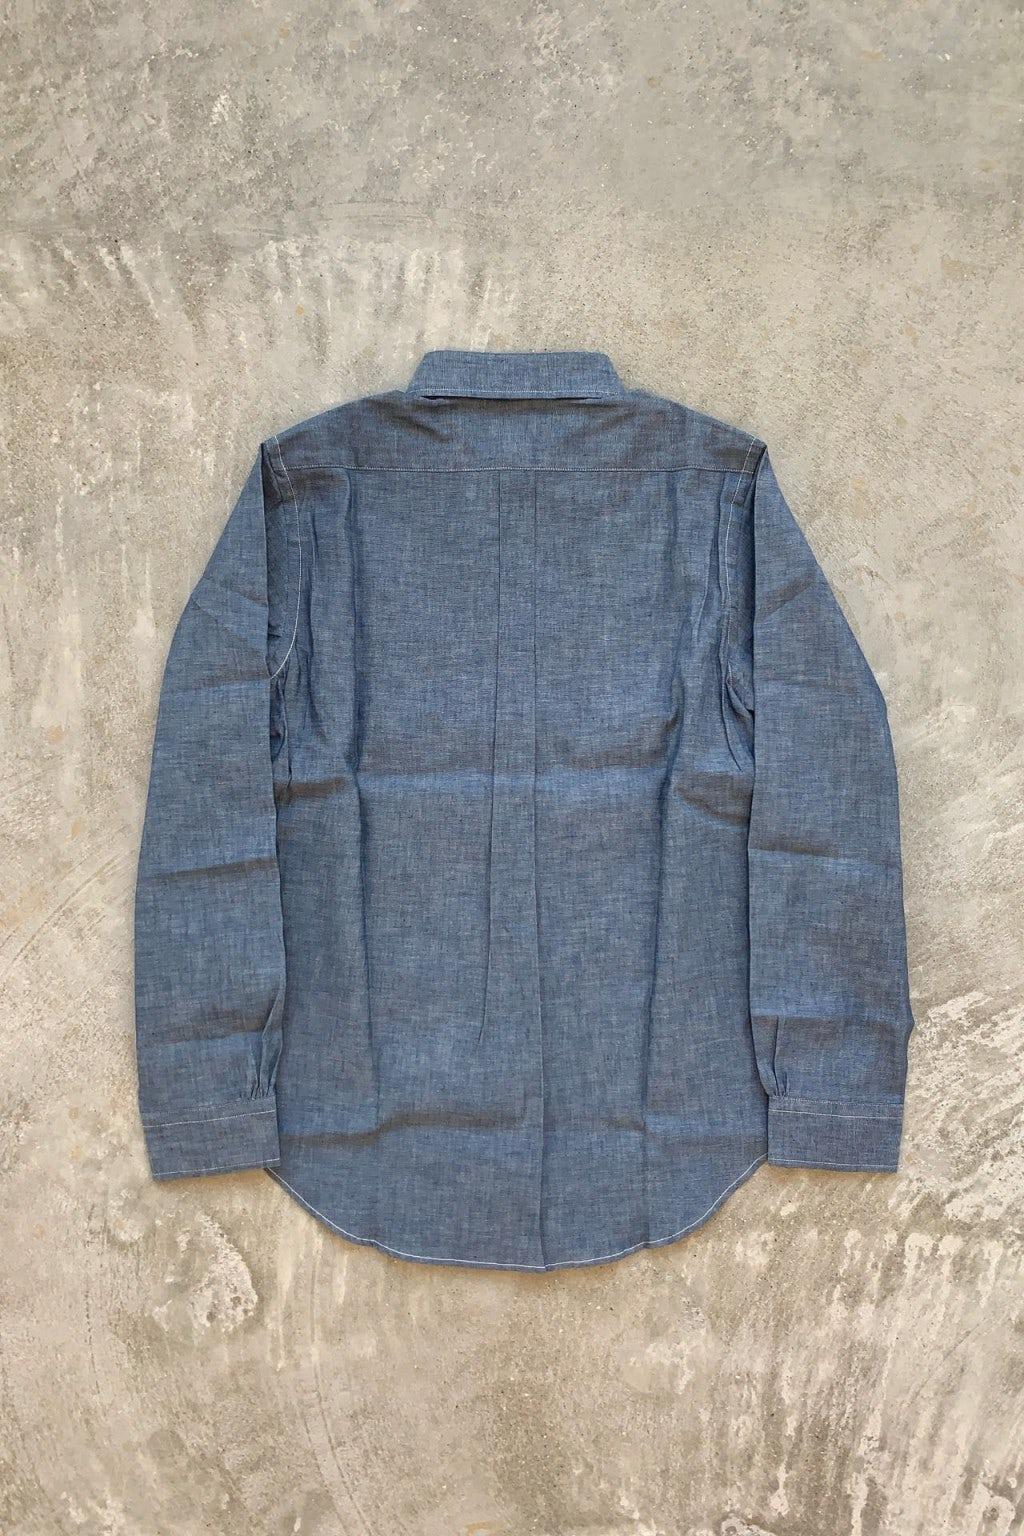 Orslow Button Down Shirt 84 Chambray